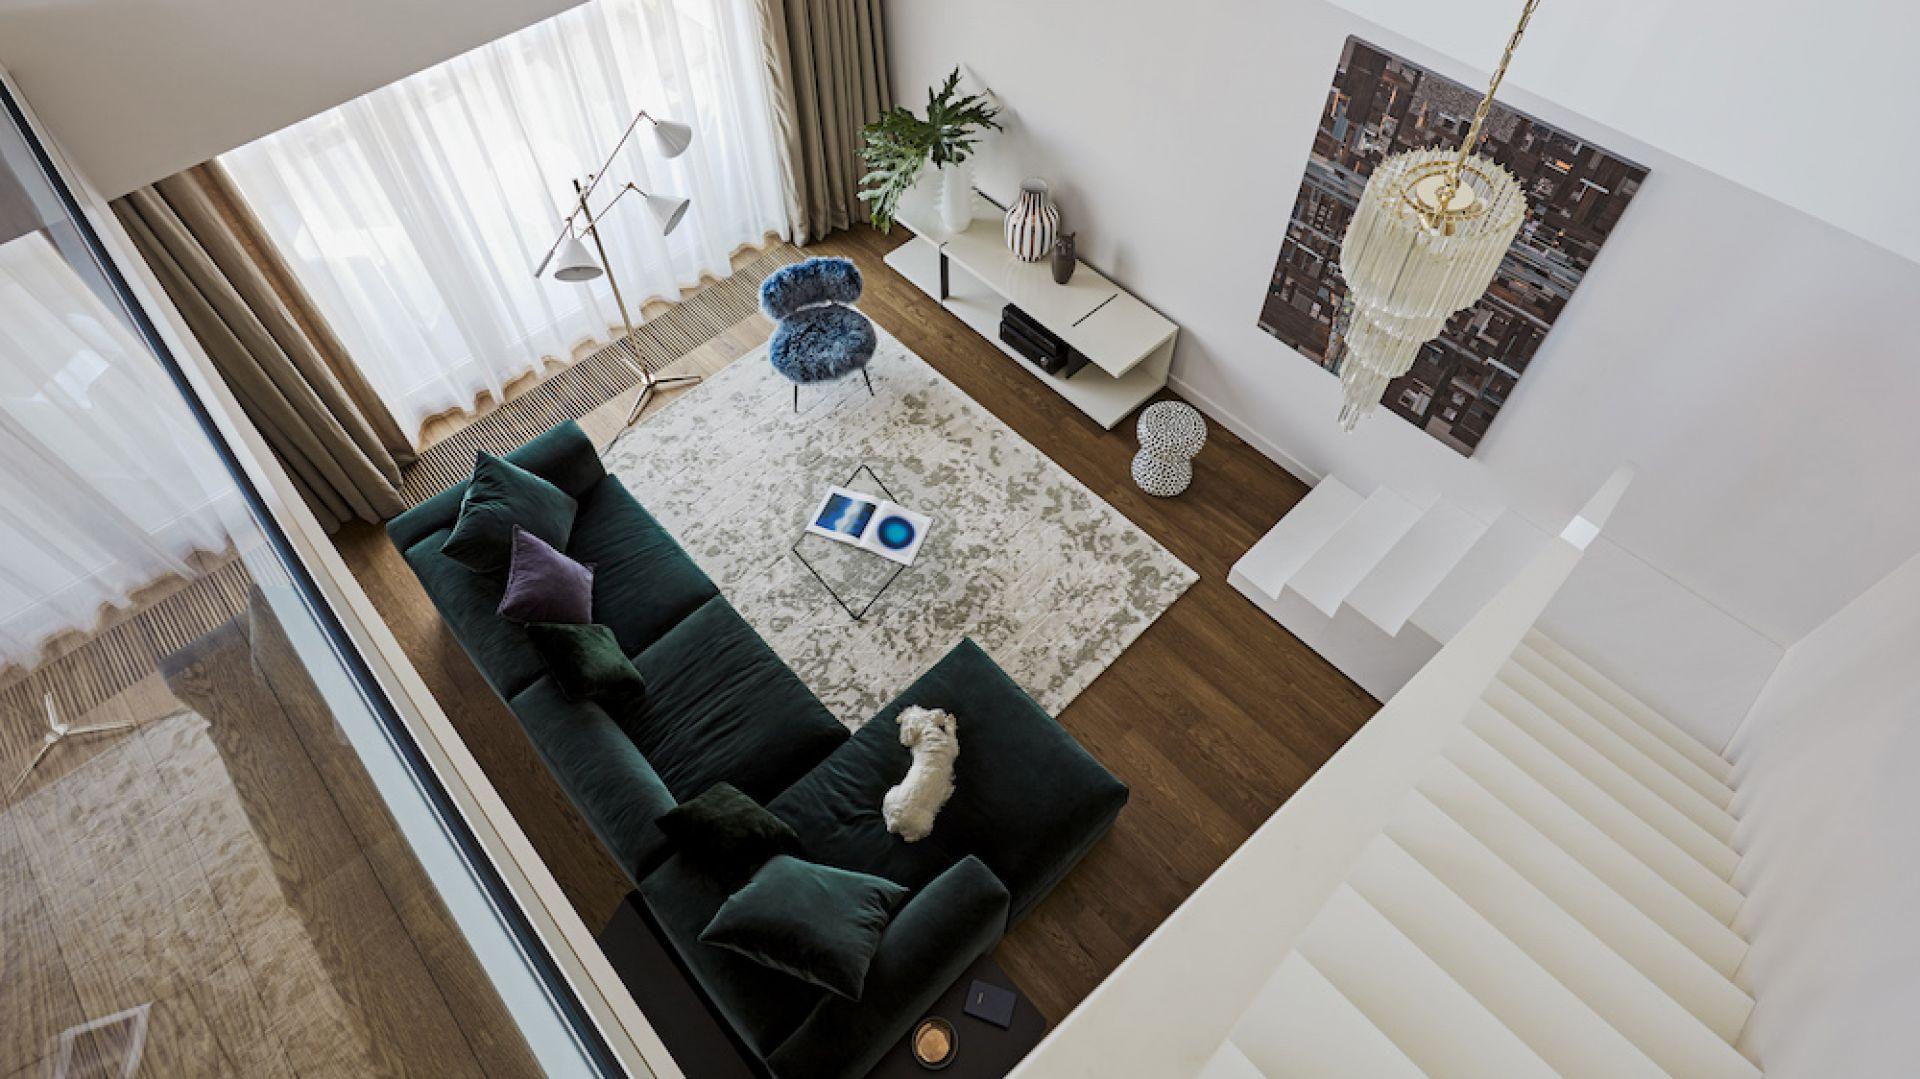 1 Mood_Works_Nowoczesny_apartament_fot.Jola_Skóra.jpg